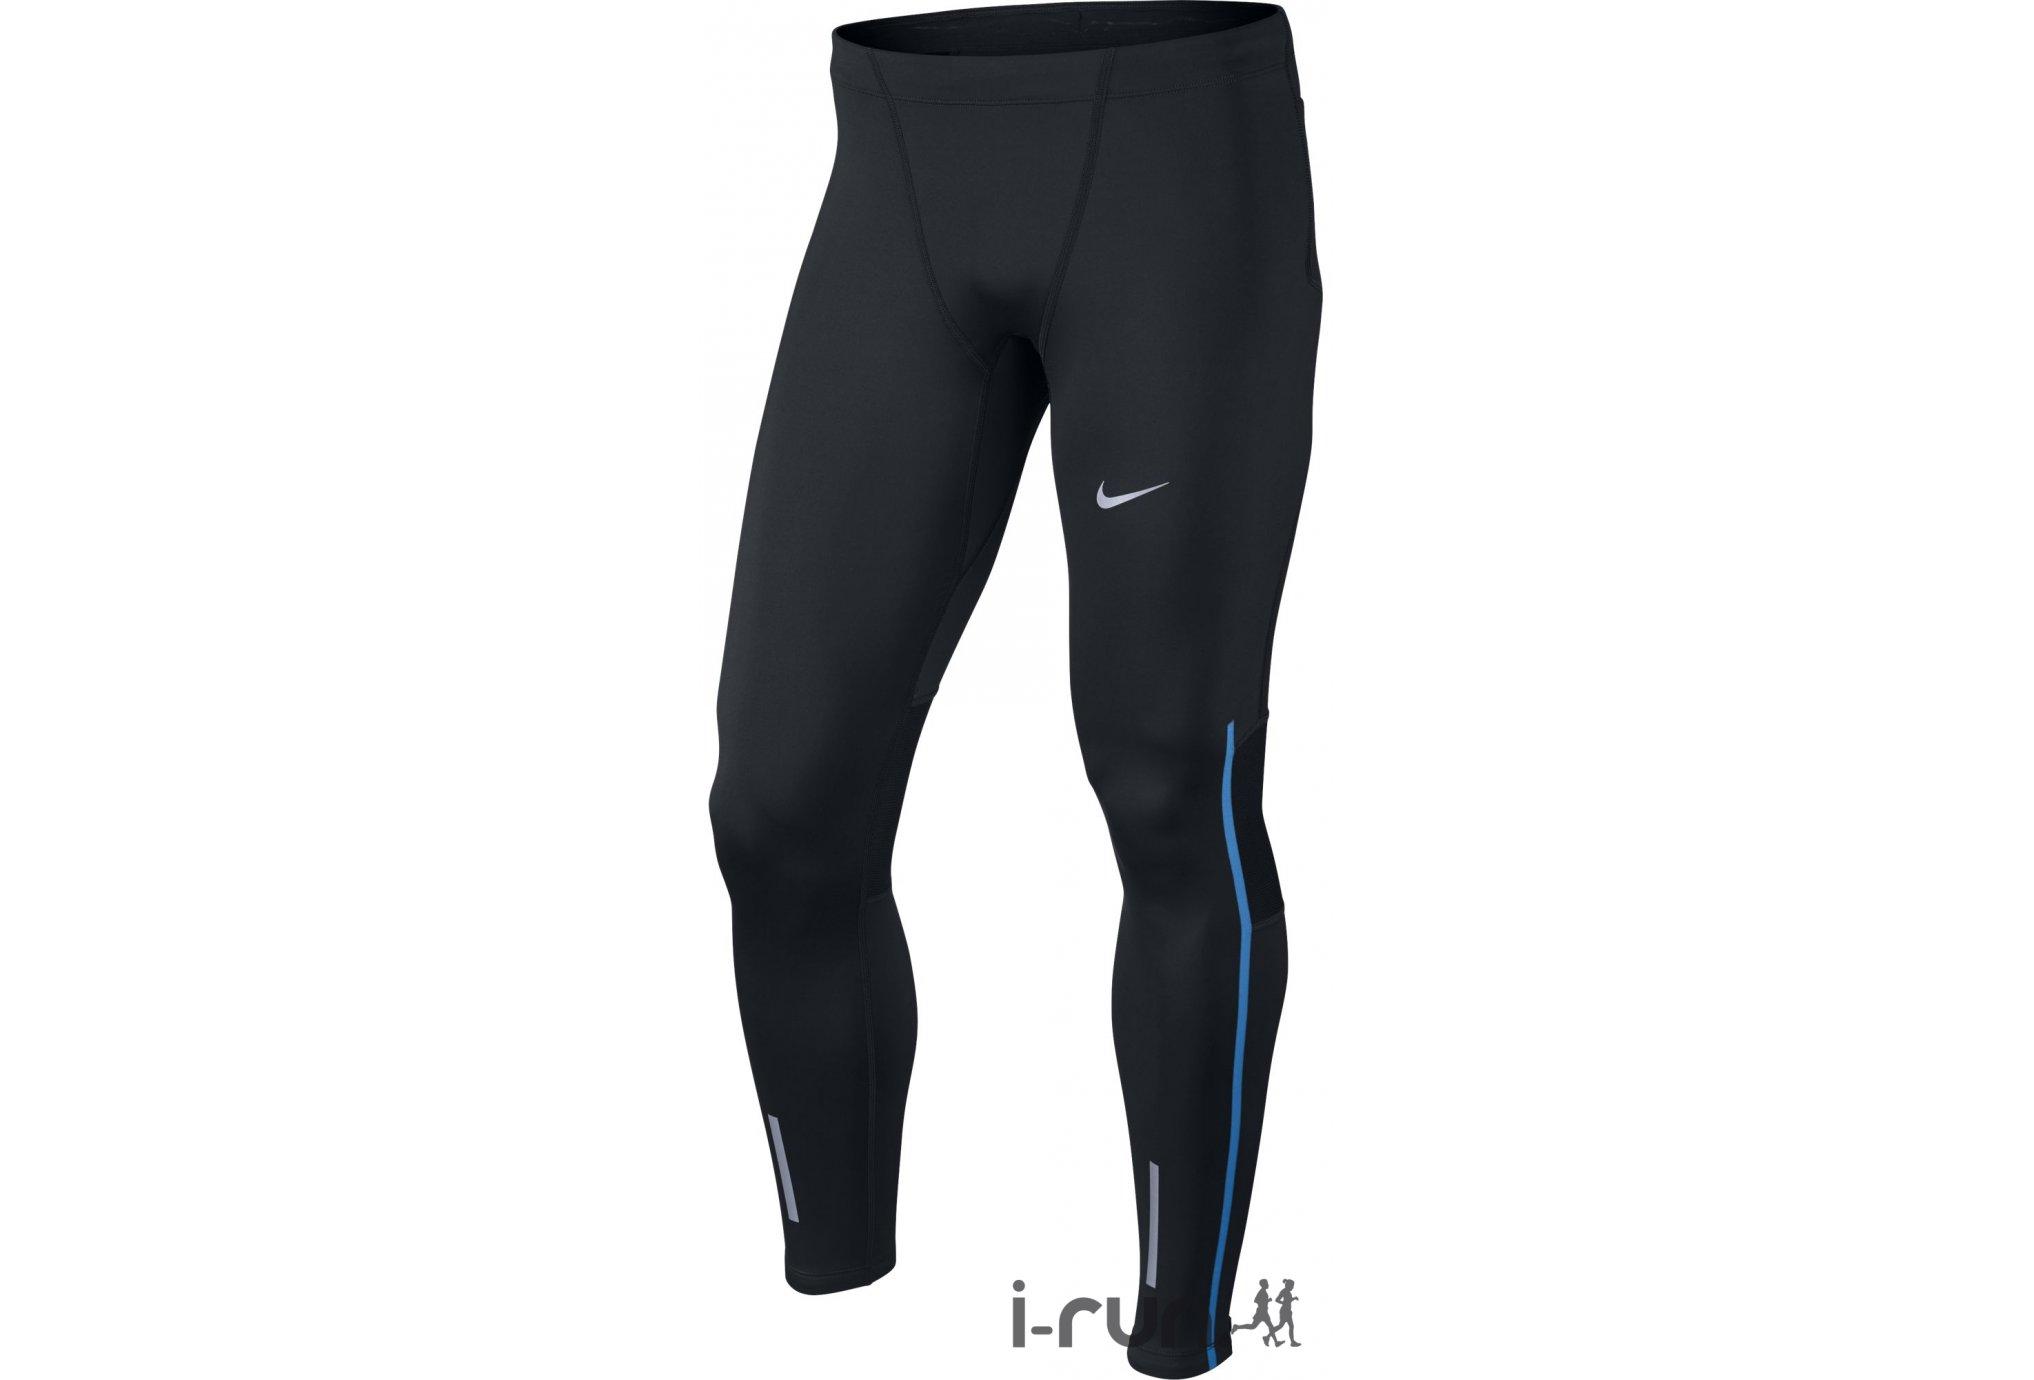 Nike Collant Tech M v�tement running homme